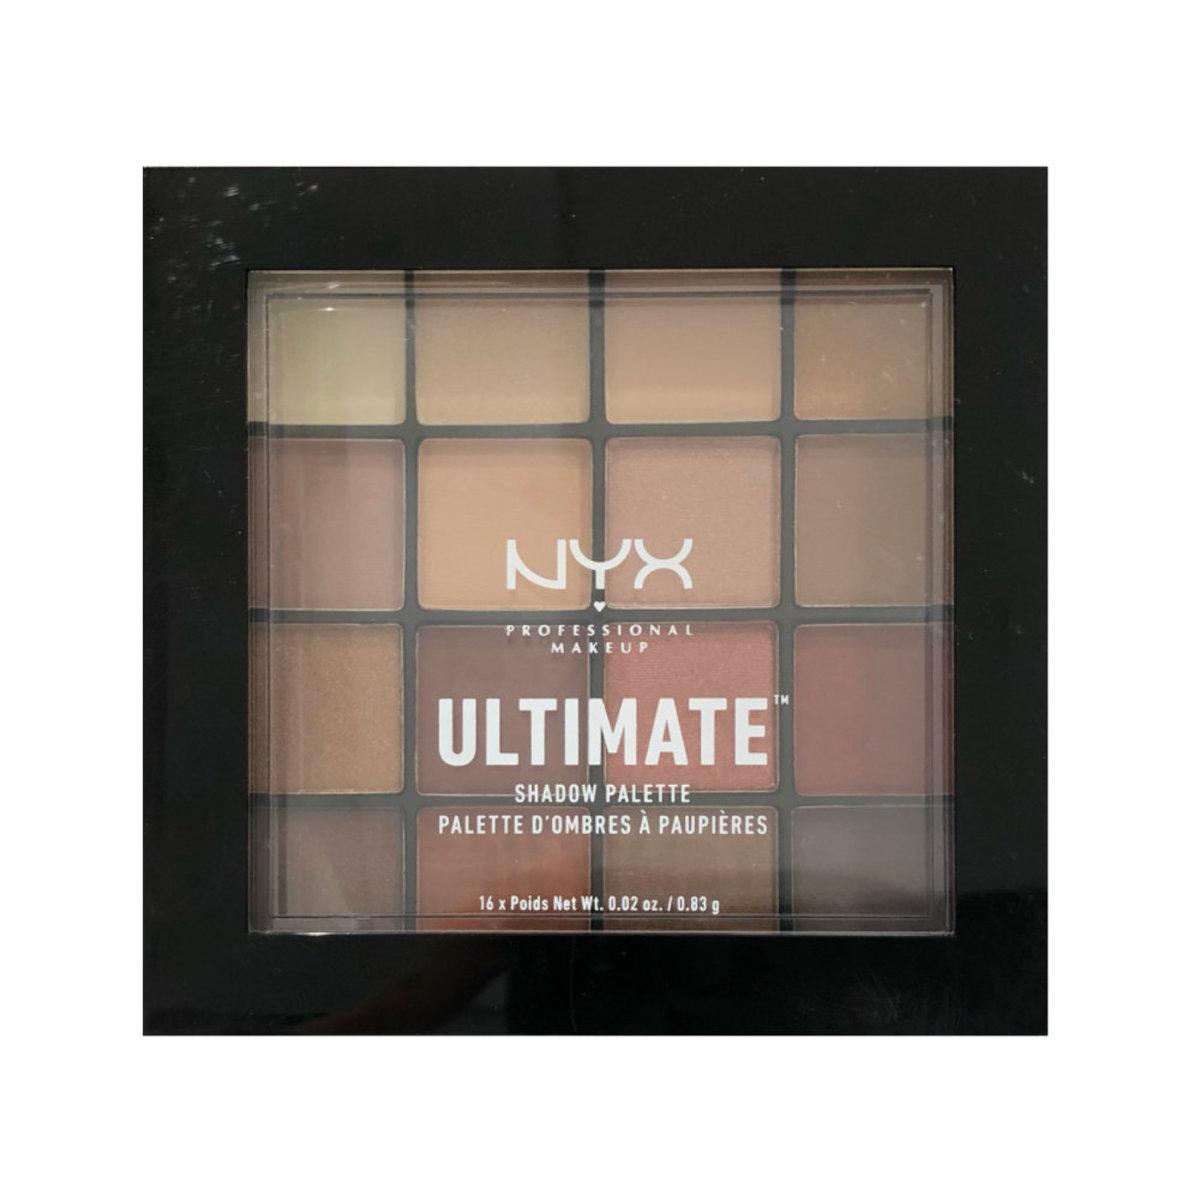 Ultimate Shadow Palette #03Warm Neutrals [Parallel Import] (800897017644)